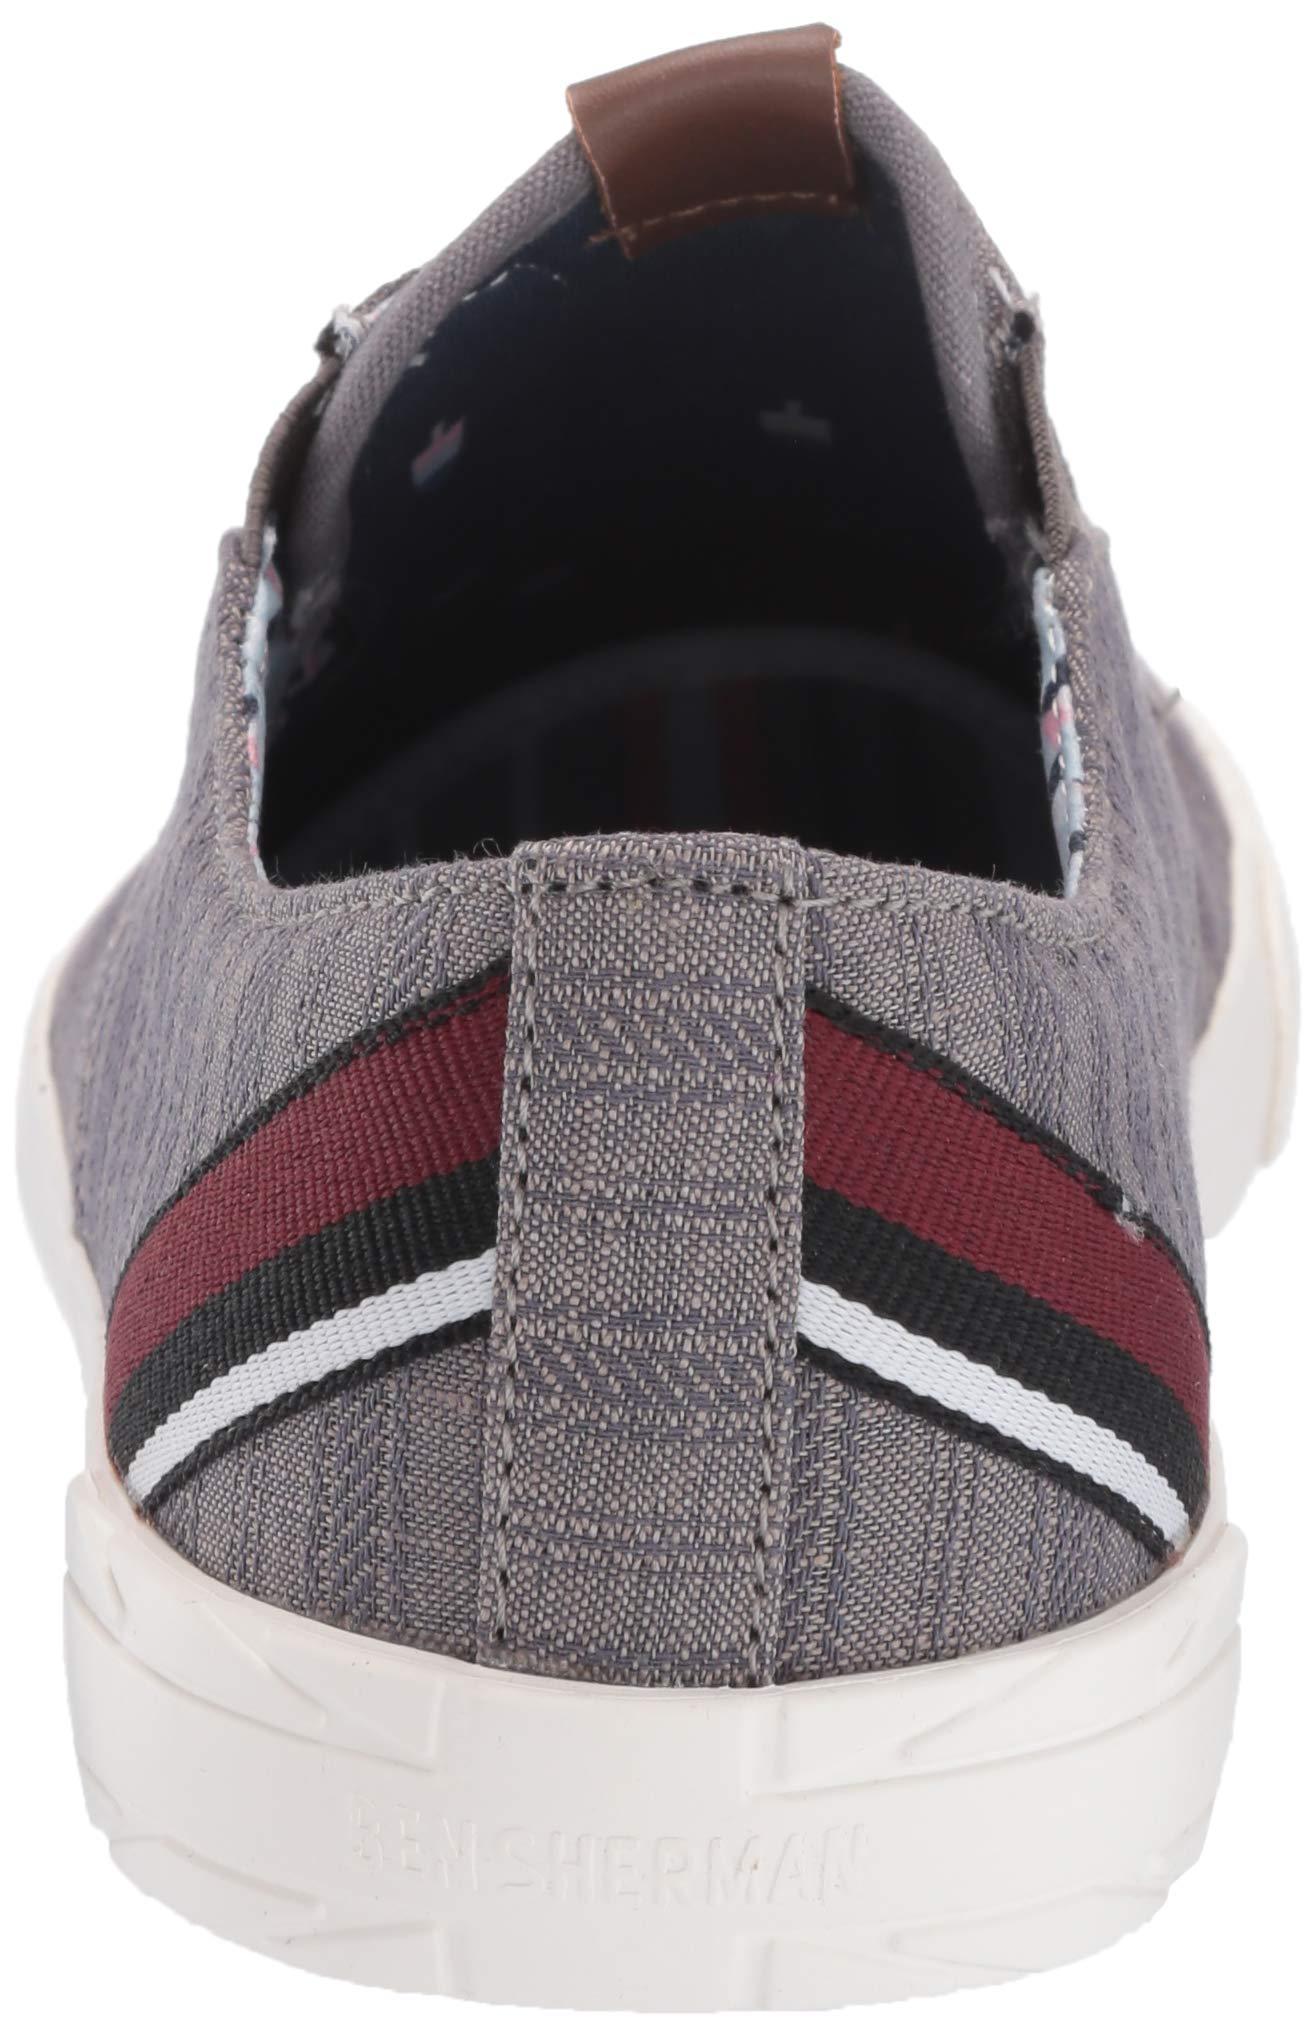 Shops Shoes Shoes Fashion Sneakers Ben Sherman Mens Pete